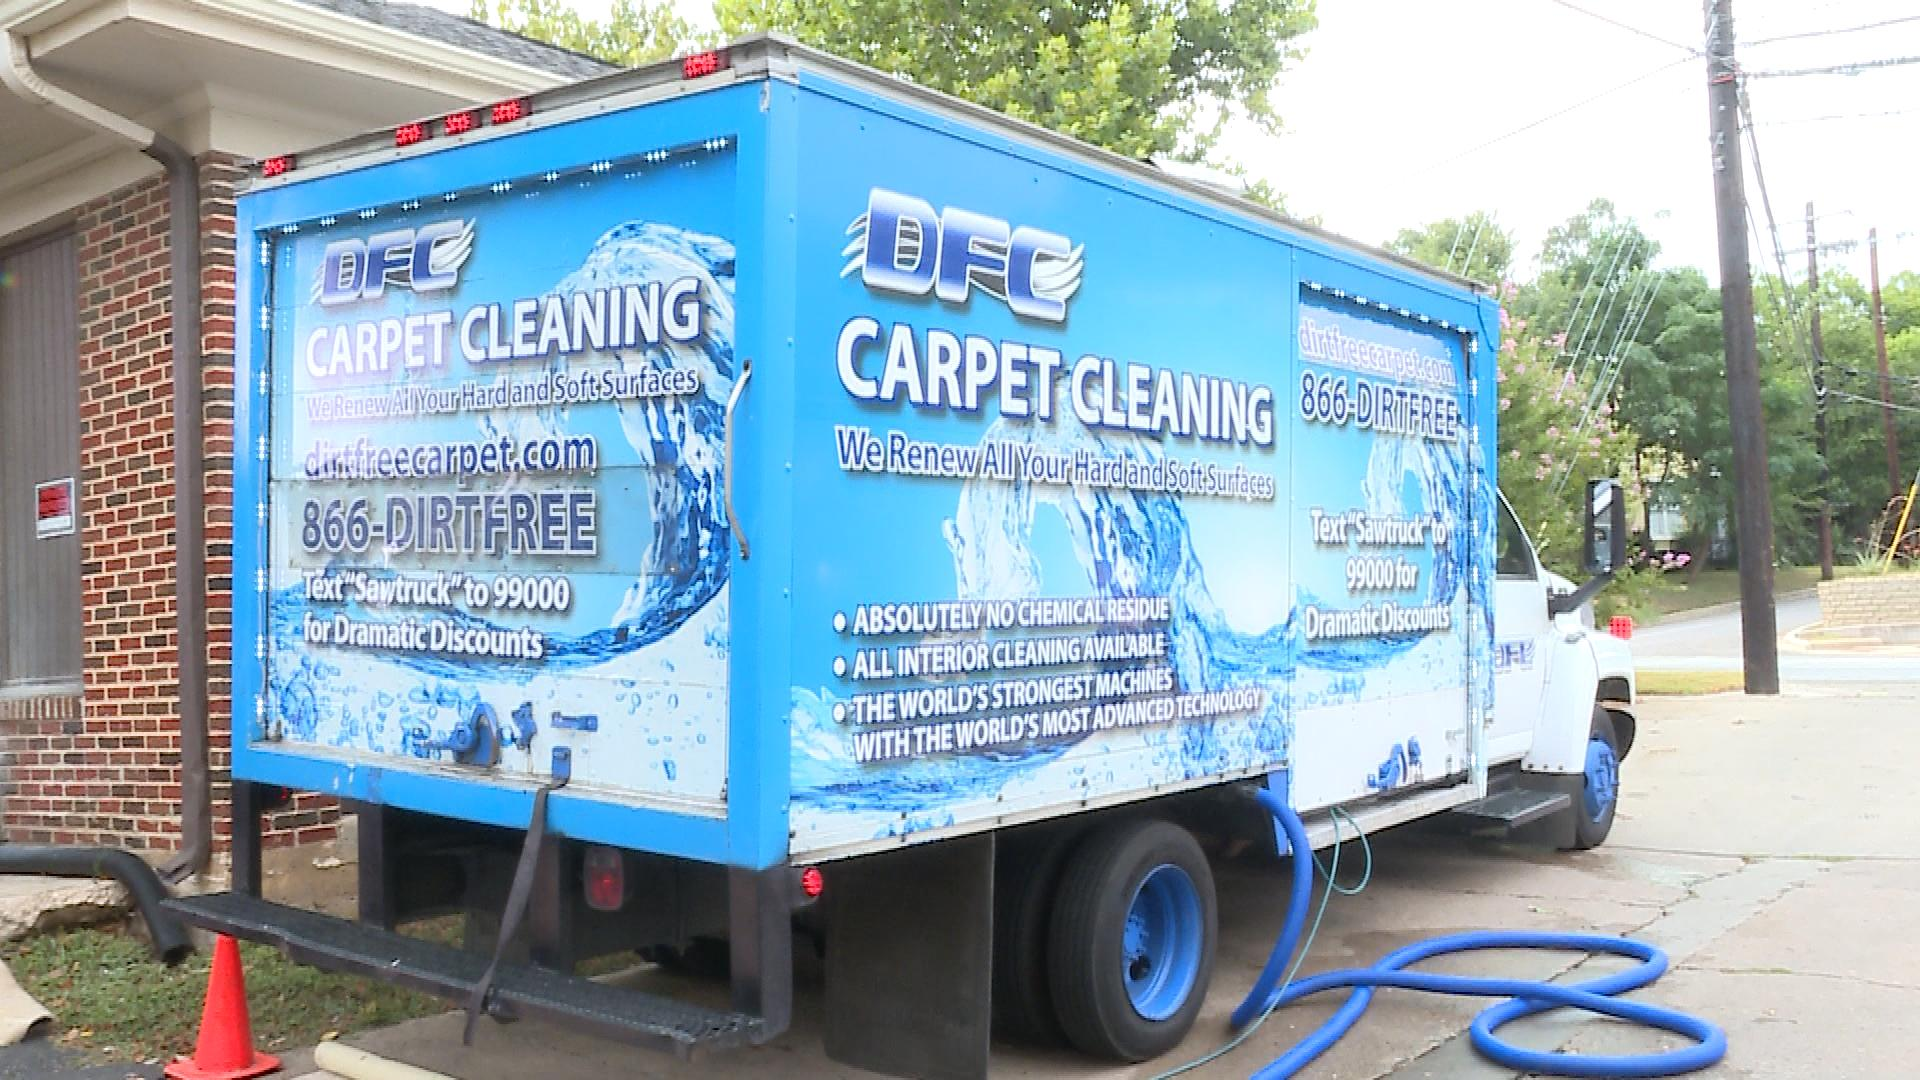 studio 512 dirt free carpet cleaning 1_1522762605294.jpg.jpg